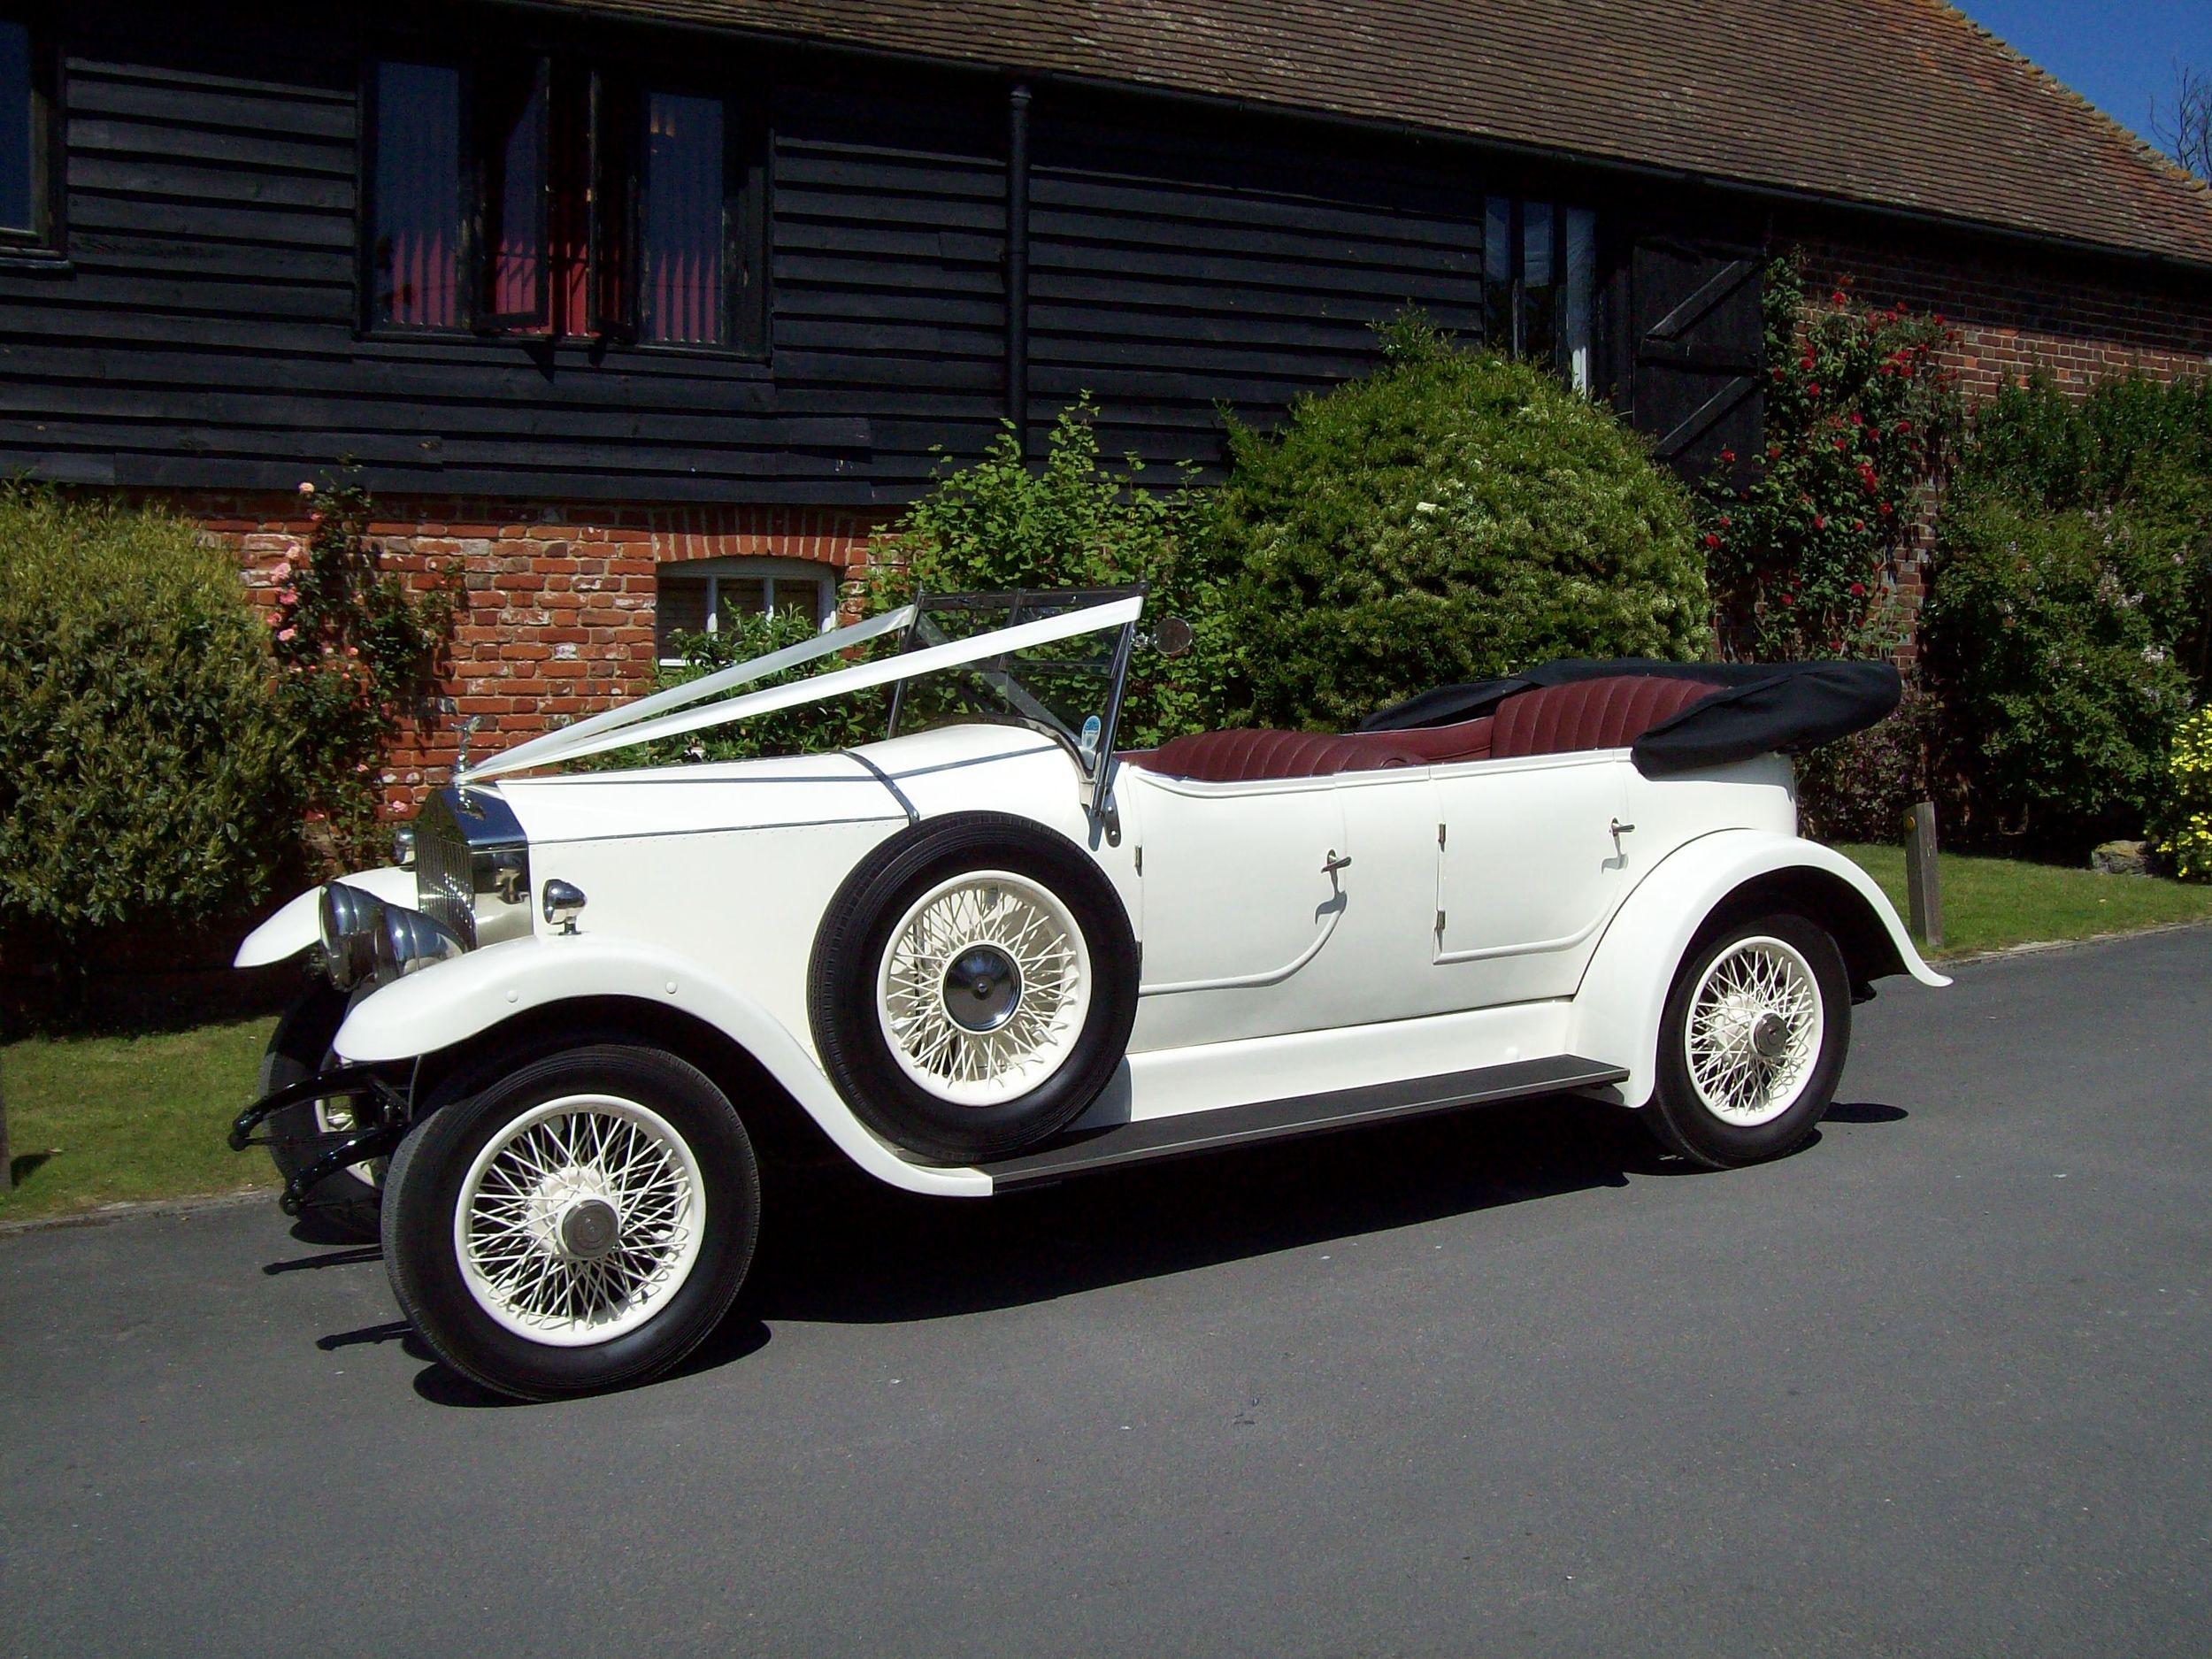 Vintage Rolls Royce Open Tourer